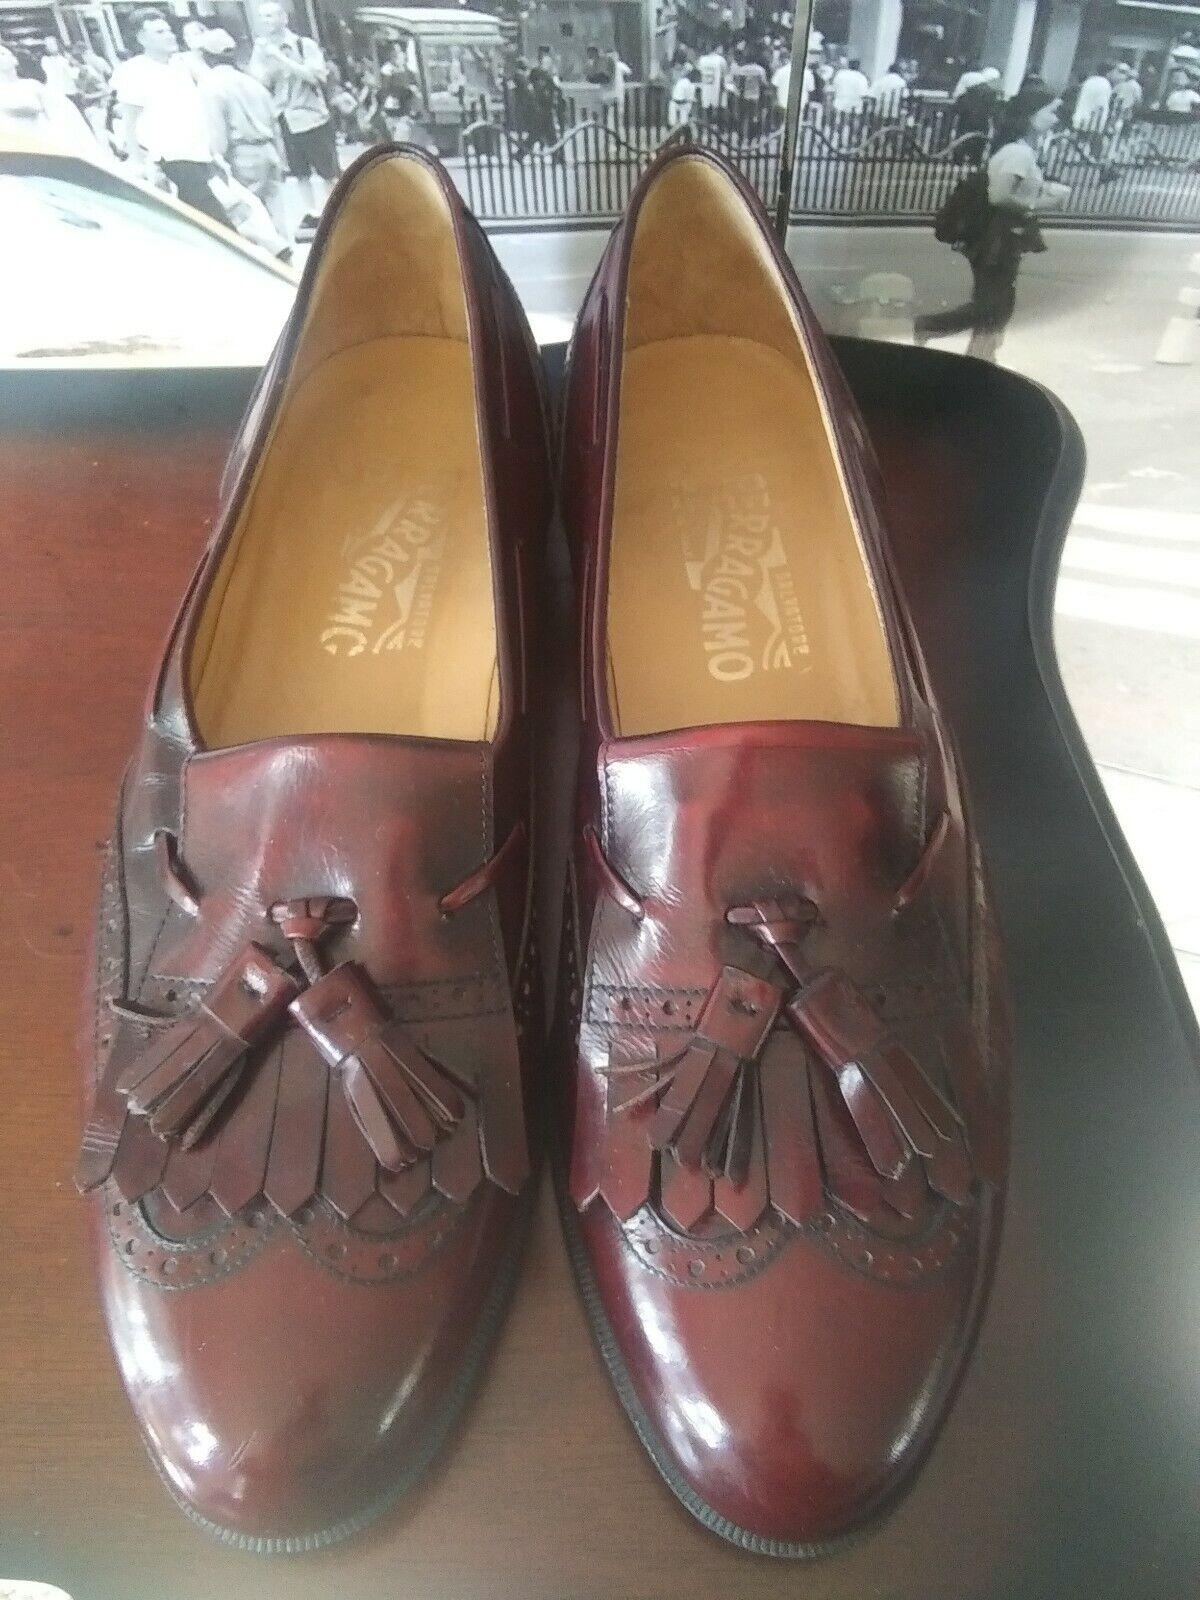 Luxury  Salvatore Ferragamo Mens Dress Loafers wing tip tassel  US 10 M Rare